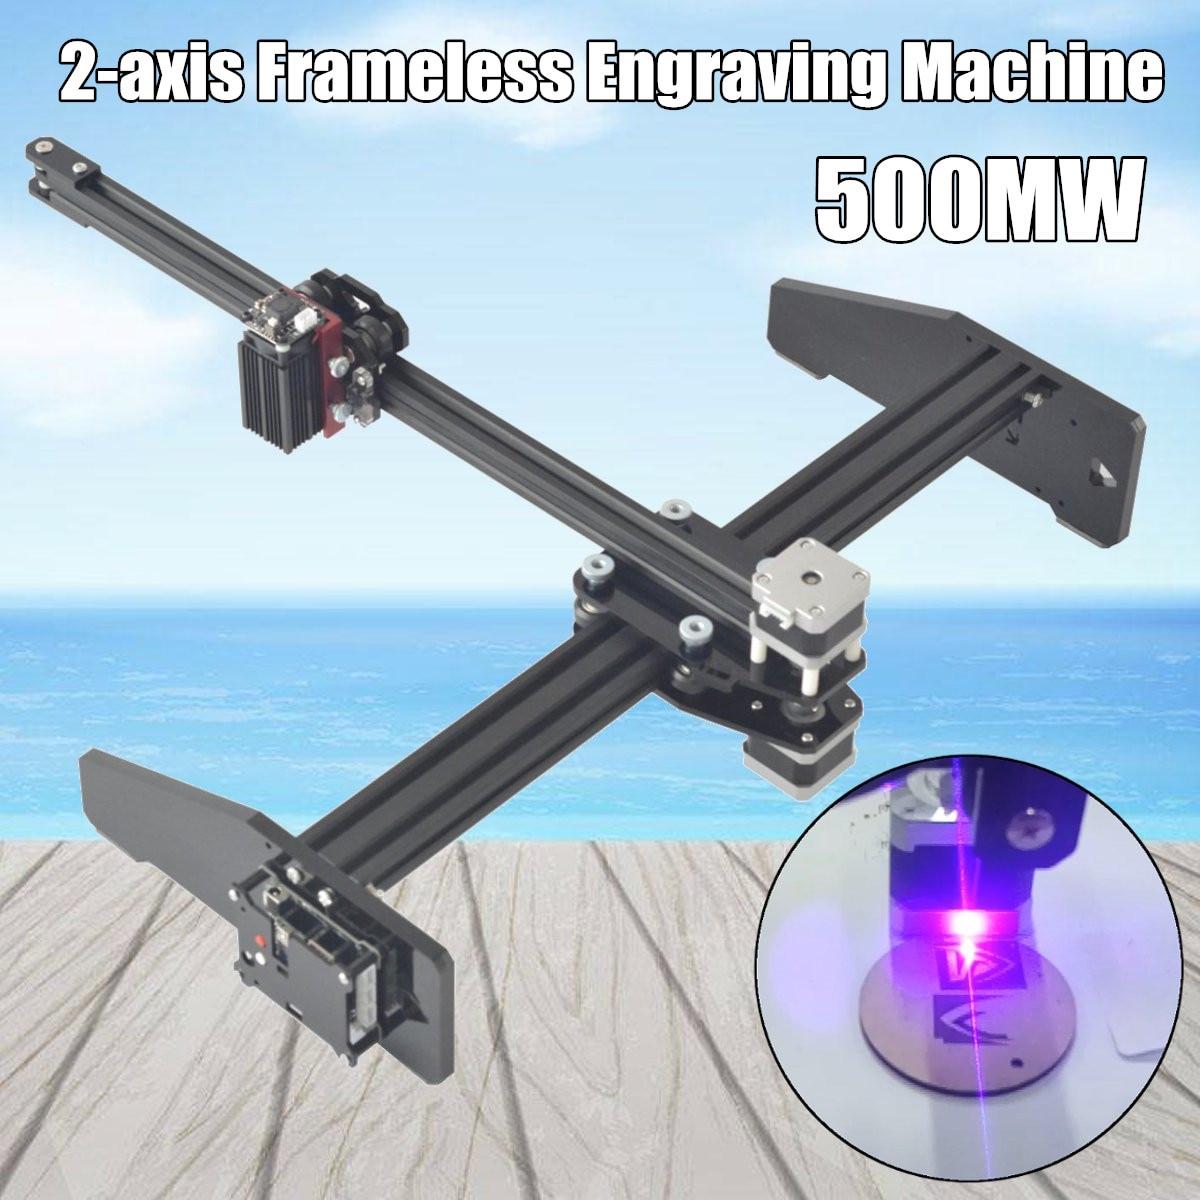 500MW 2 Axis Laser Engraving Machine Cutting Engraver CNC Logo Printer Machine DIY Laser Engraver Machine Wood Router diy mini laser machine 6040 6090 small laser cutting machine 60w laser engraver for wood